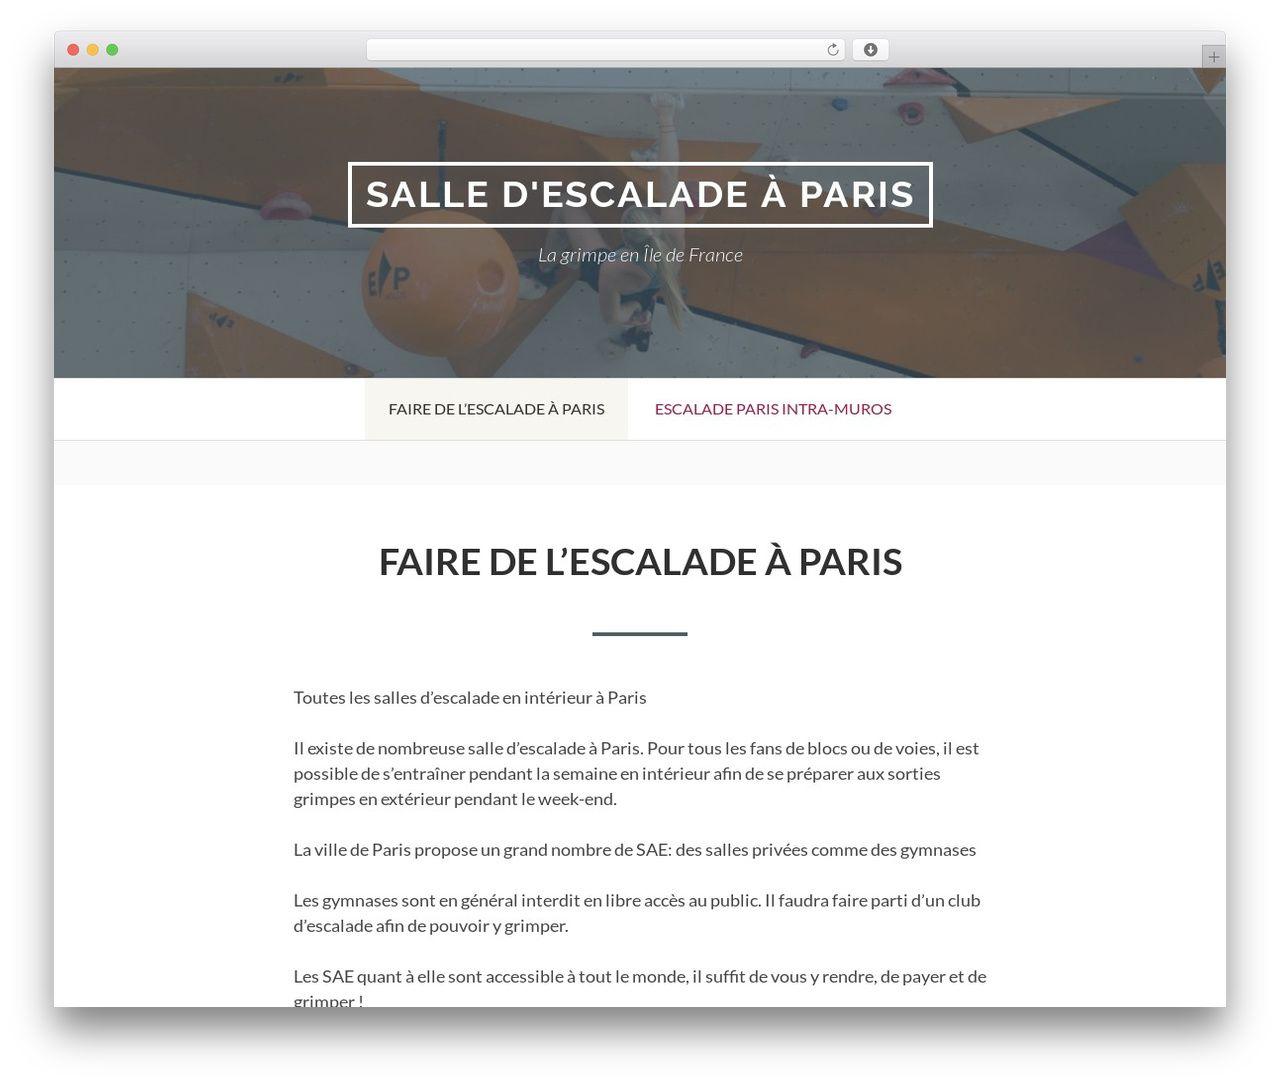 Business Plan Salle D Escalade toivo lite free wp themesami keijonen - paris-escalade